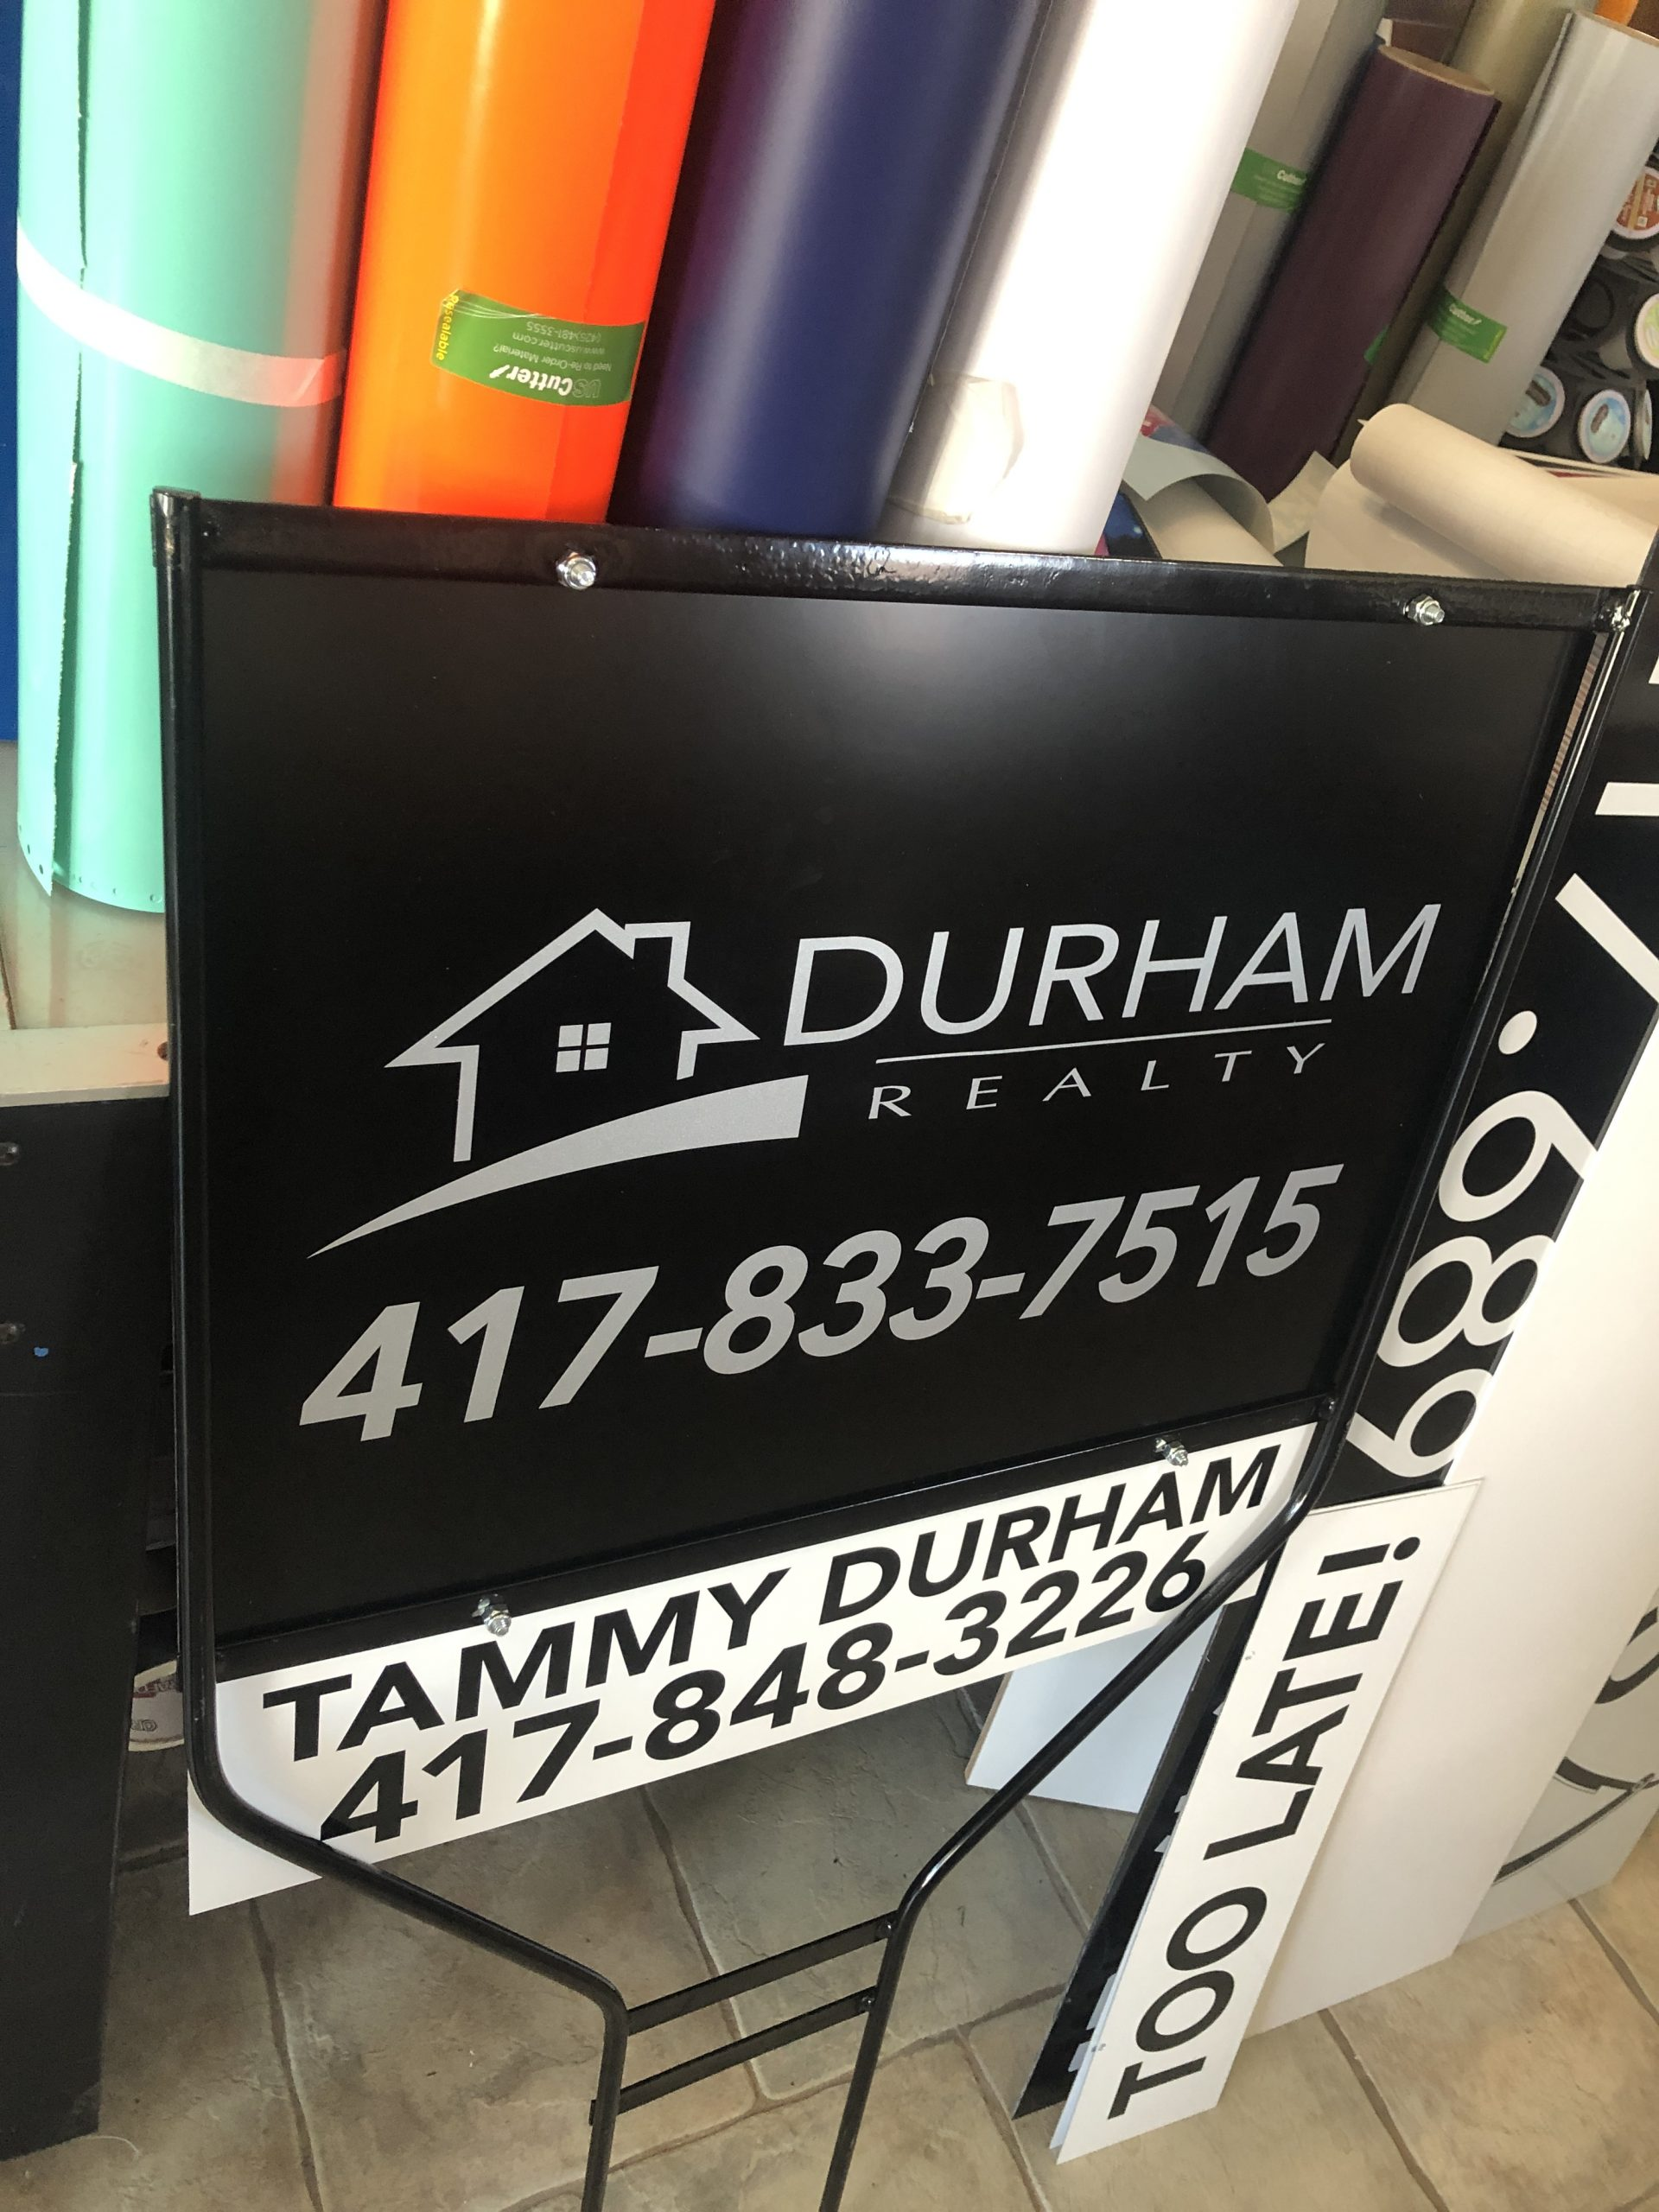 Durham Realty